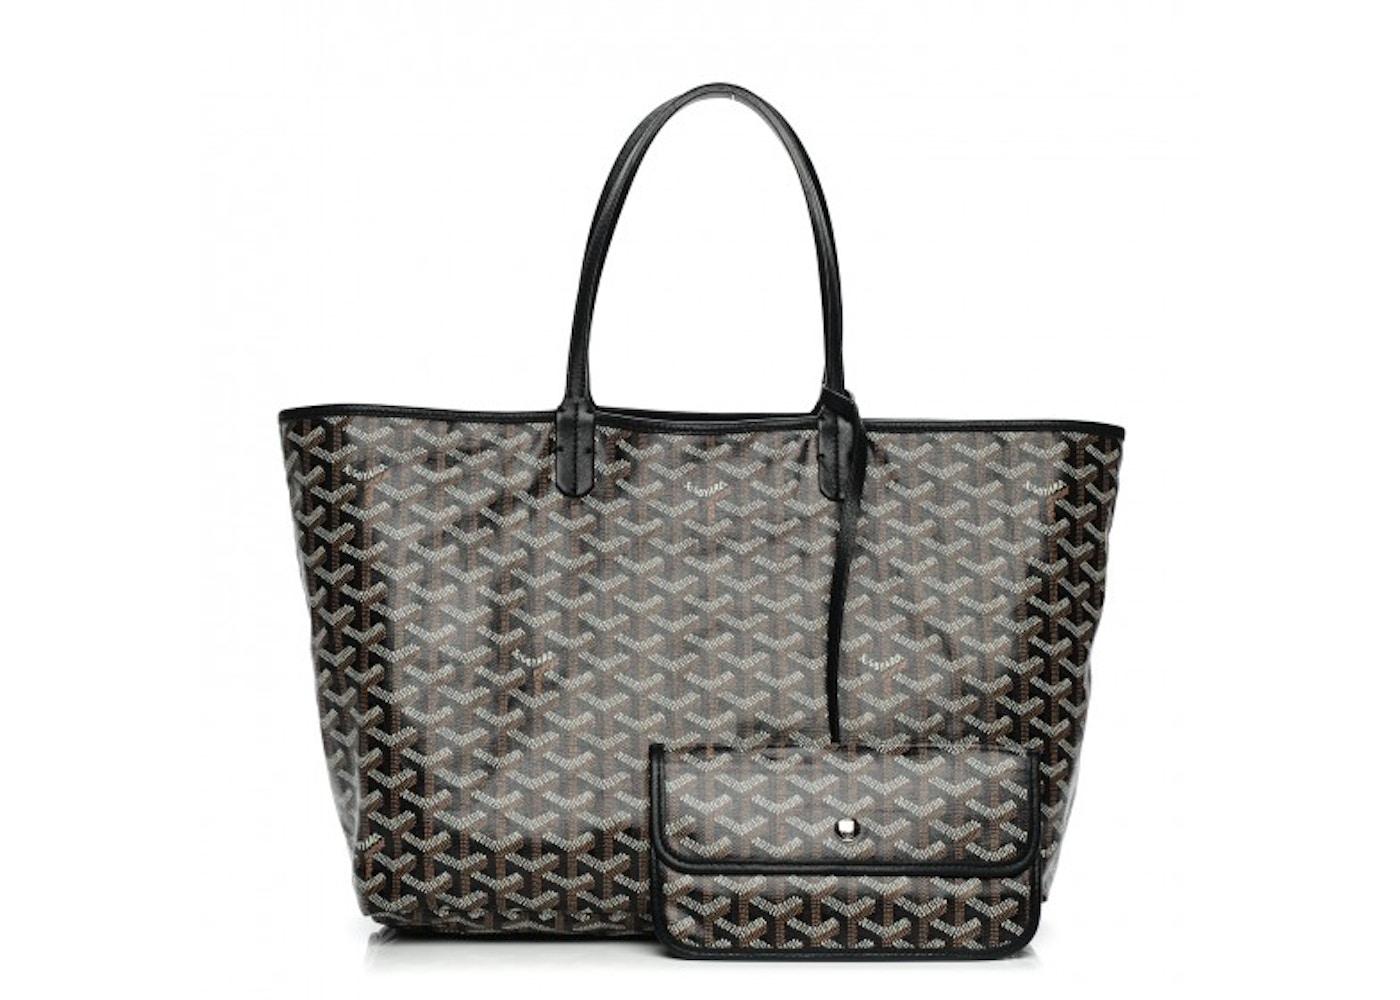 cute cheap buy good innovative design Goyard Saint Louis Tote Goyardine PM Black